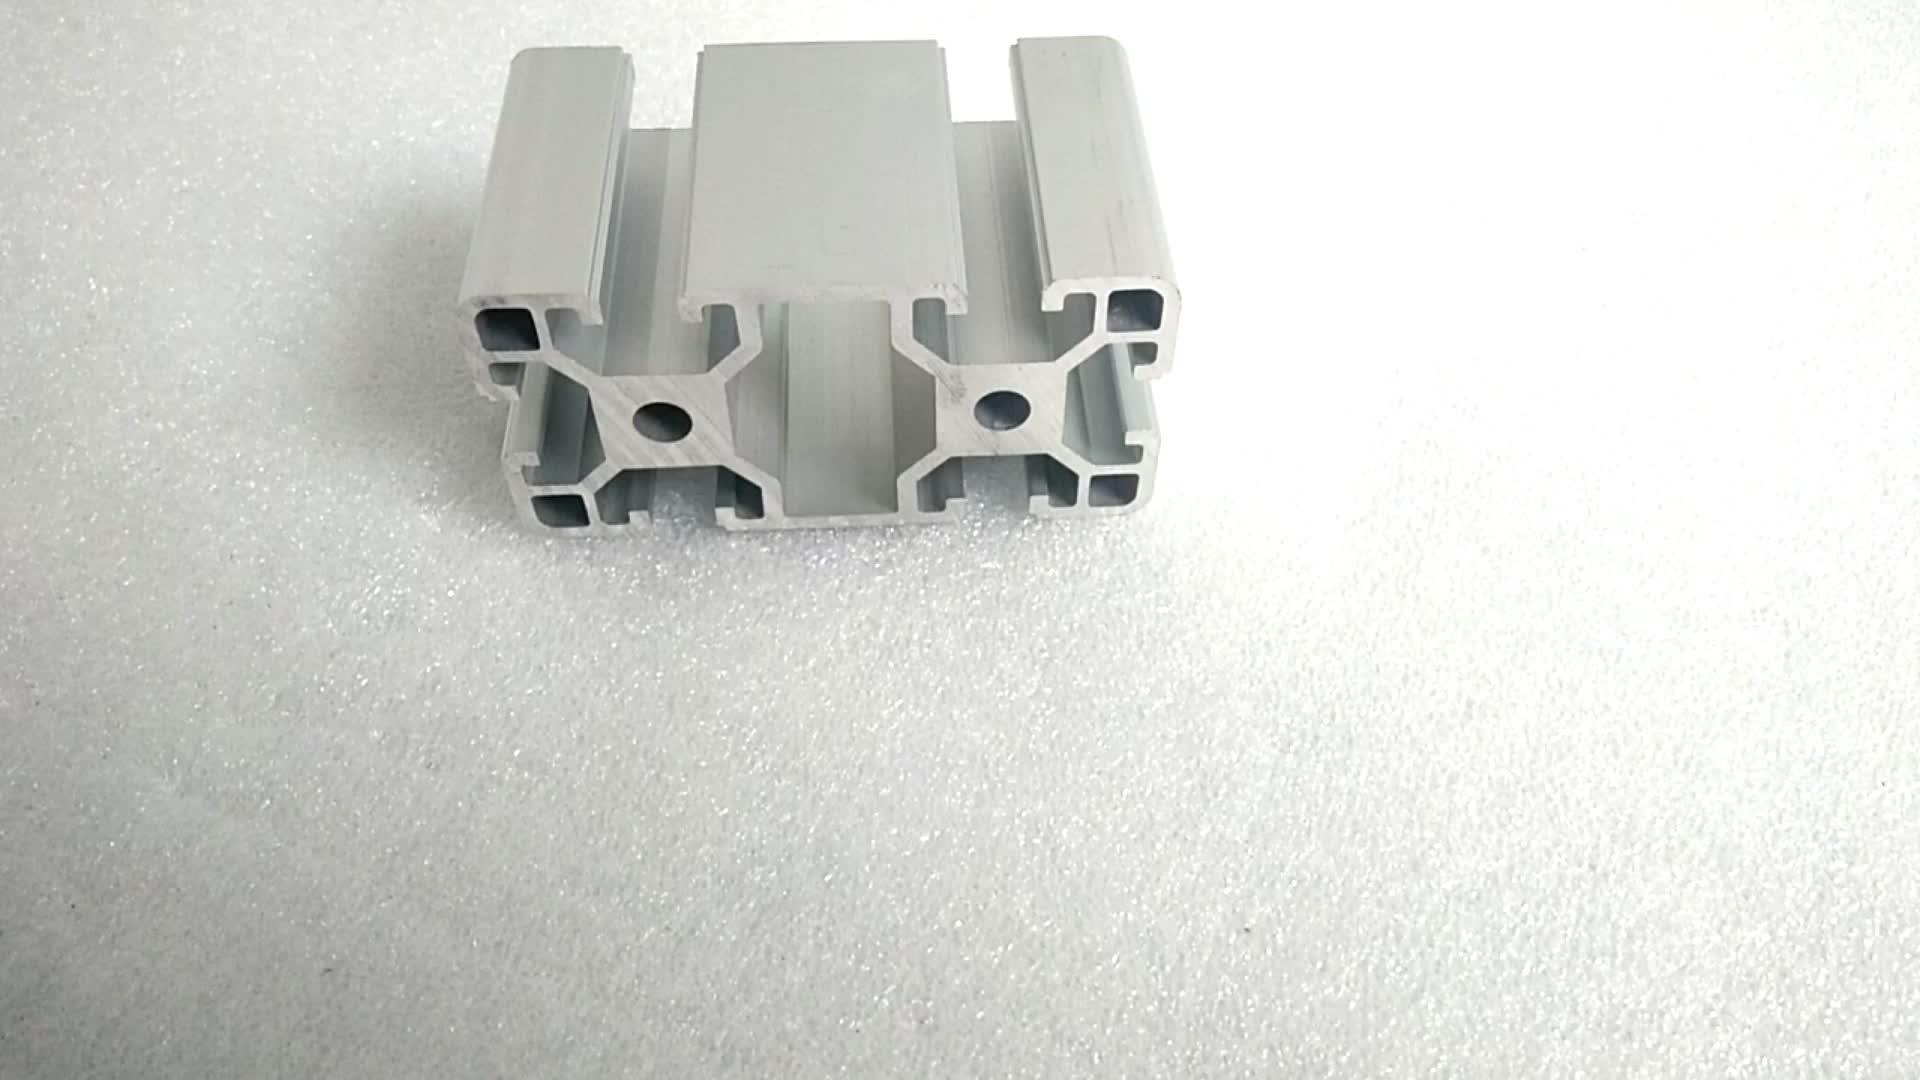 8 slot  4080 aluminum extrusion profiles for industrial conveyor belt